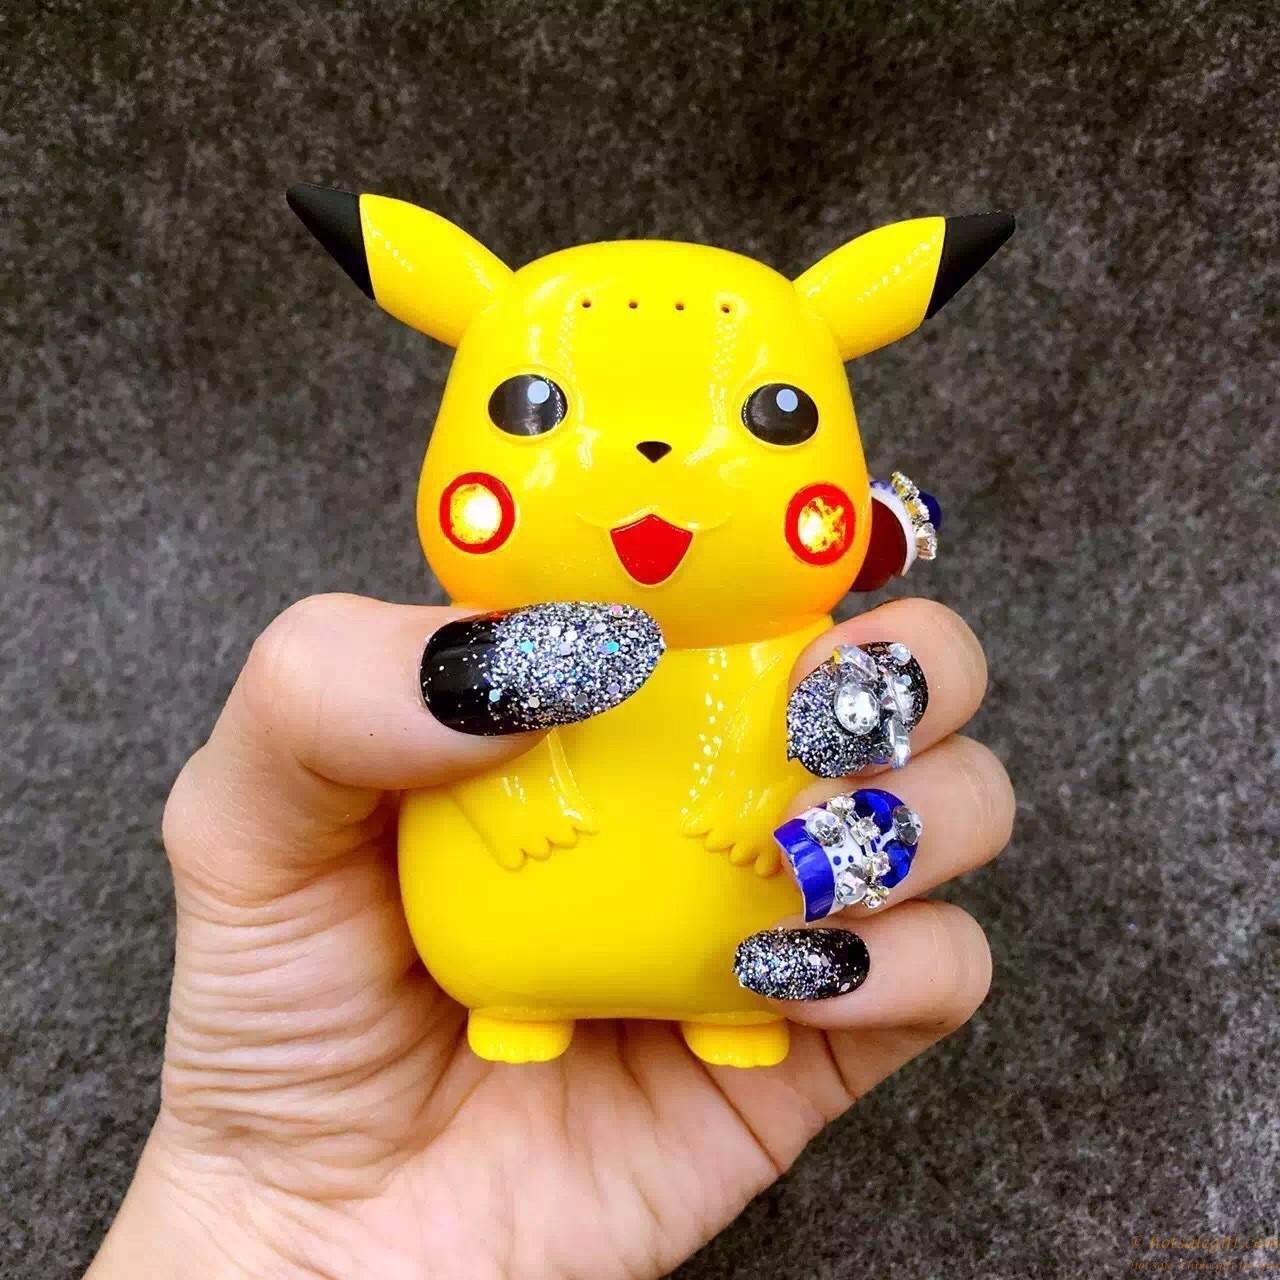 10000mah Pokemon Pikachu Pokeball Power Bank For Iphone